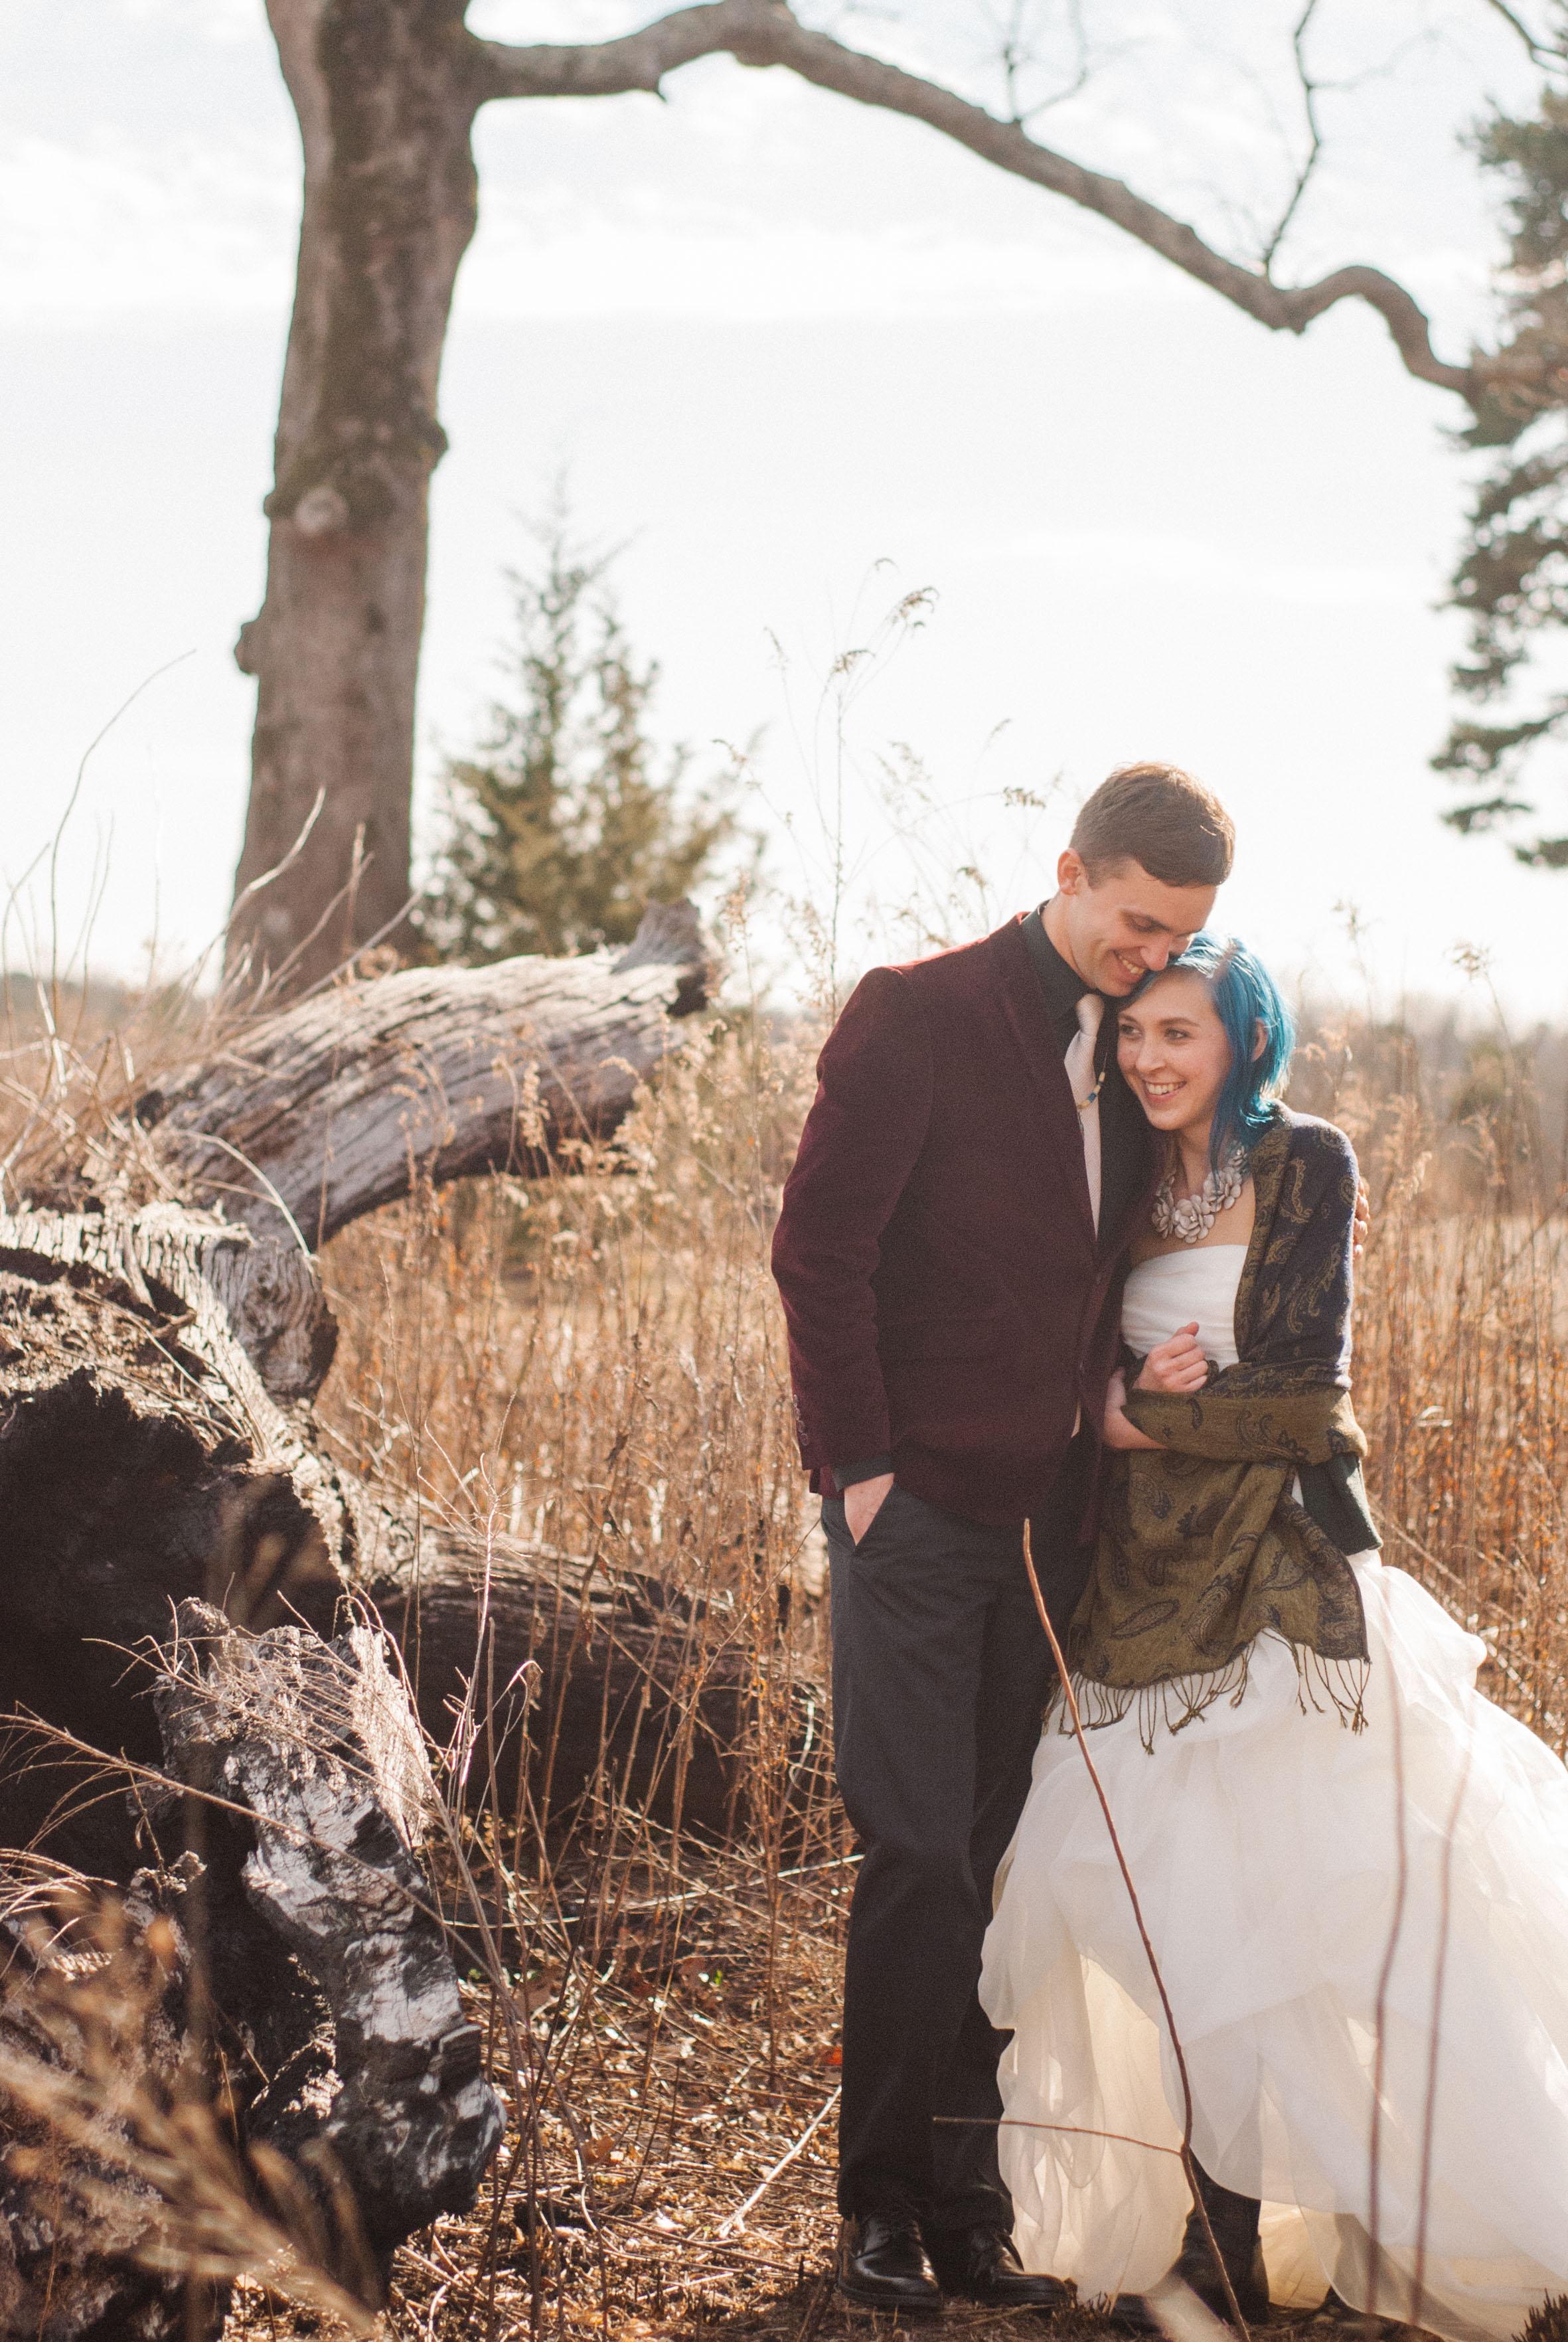 2016 Wedding - Peter + Danielle-25.jpg